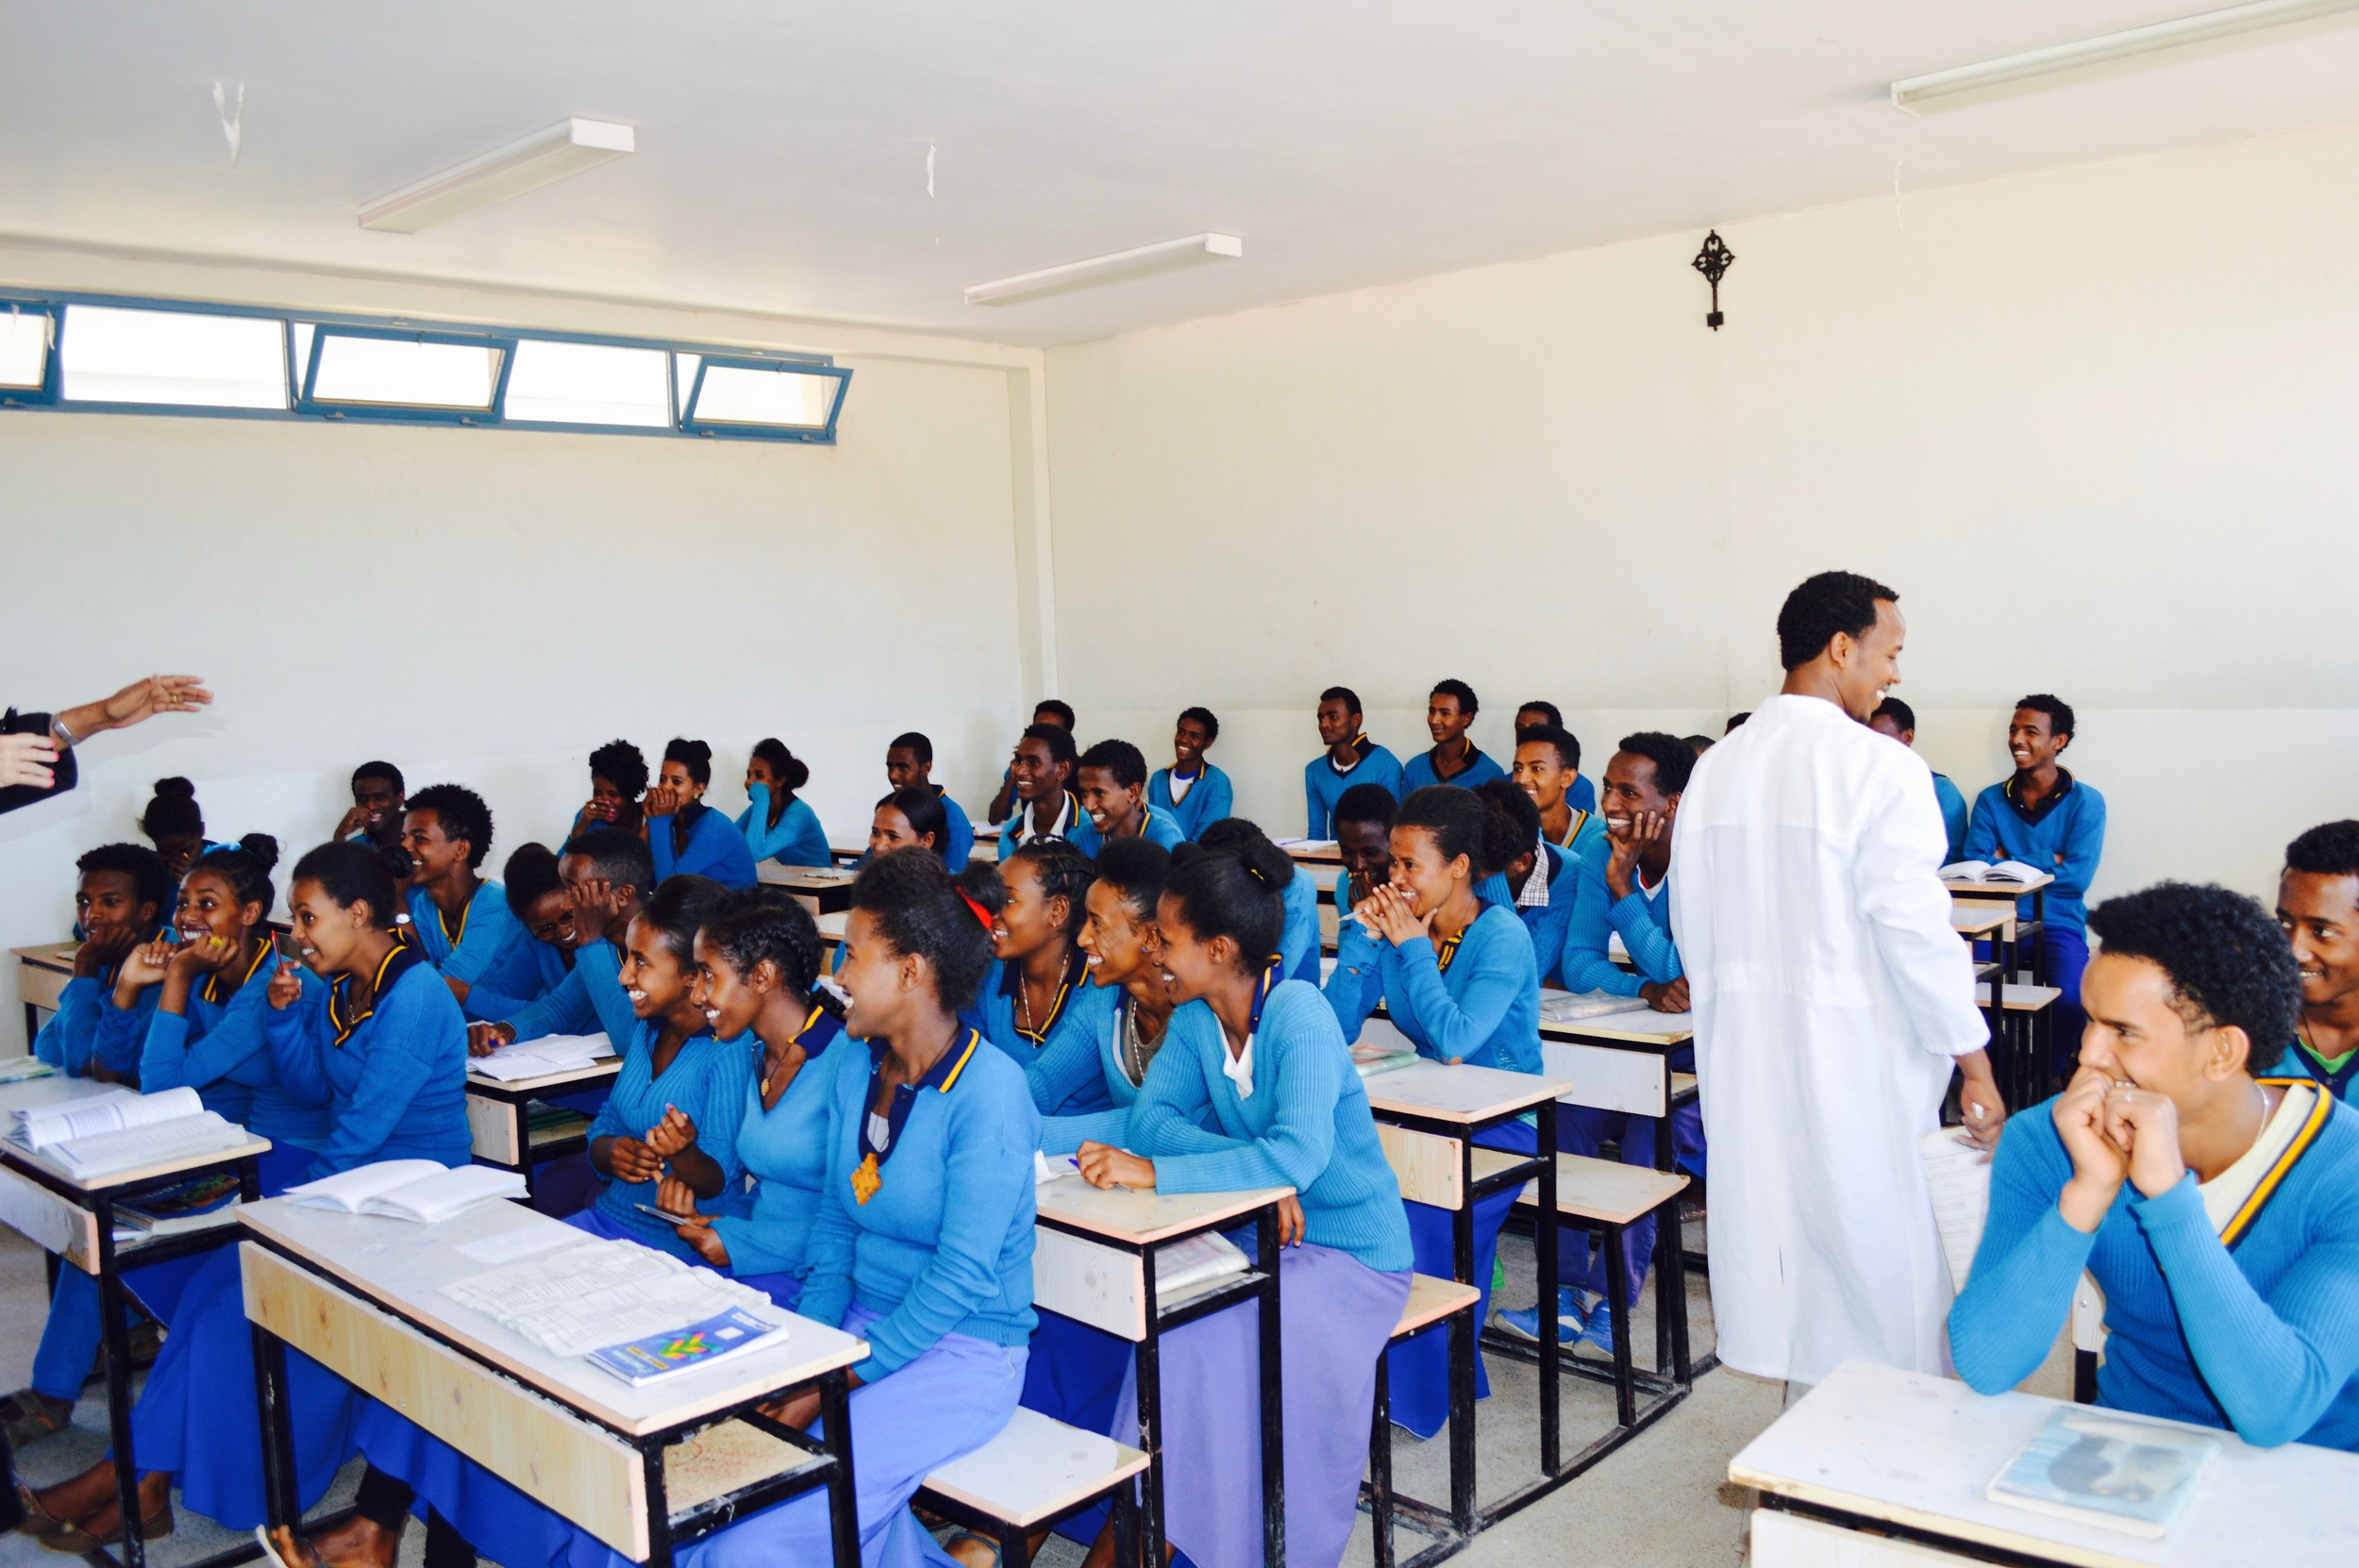 Tsinseta -Mariam Senior Secondary School - Adigrat   9th -12th Grade  823 Students  Number of teachers: 27  Cost per student: $86/£66